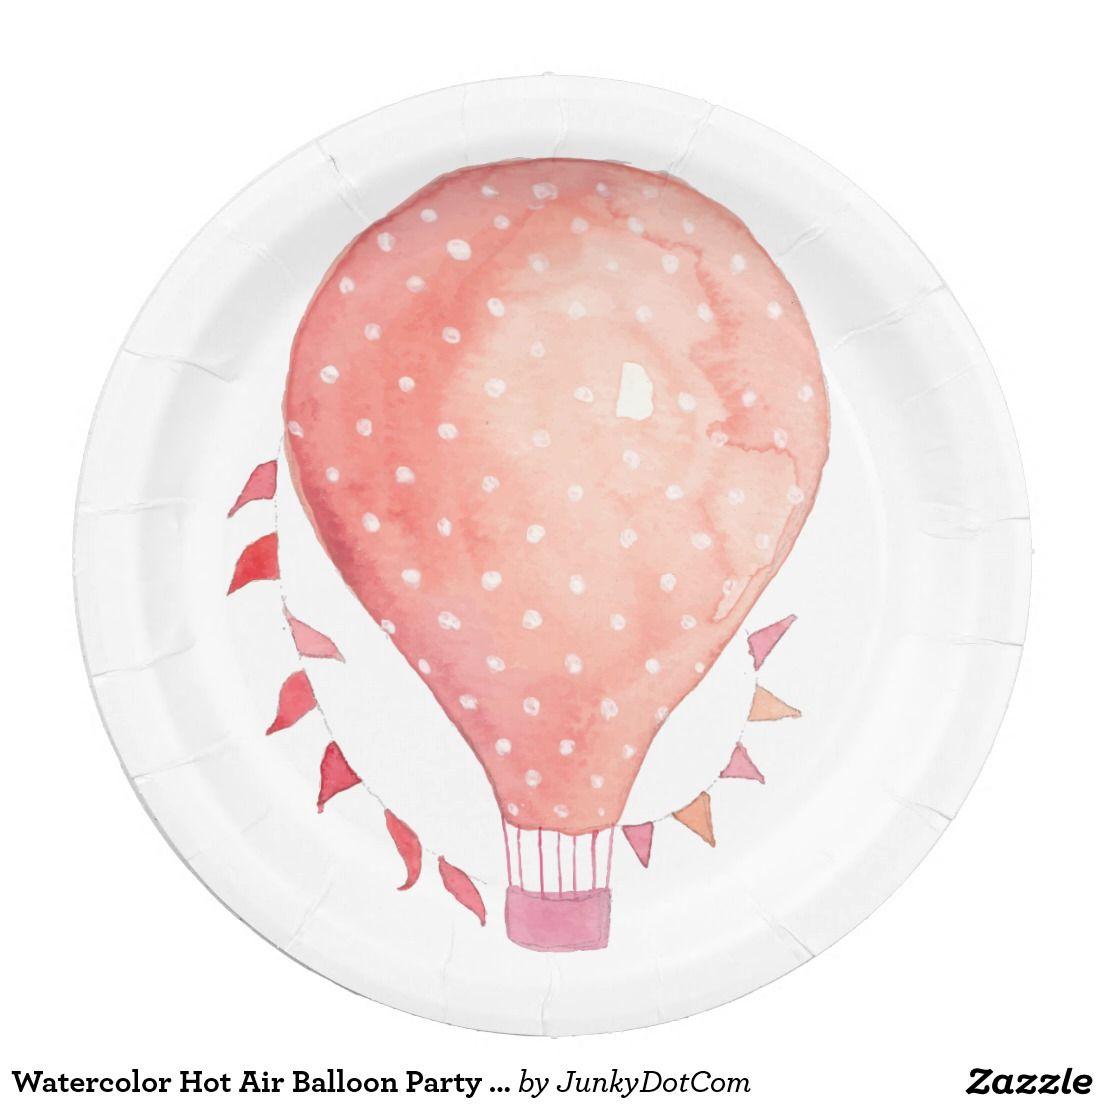 Watercolor Hot Air Balloon Party Peach Paper Plate @zazzle #junkydotcom Aug 21 2016 16x  sc 1 st  Pinterest & Watercolor Hot Air Balloon Party Peach Paper Plate @zazzle ...